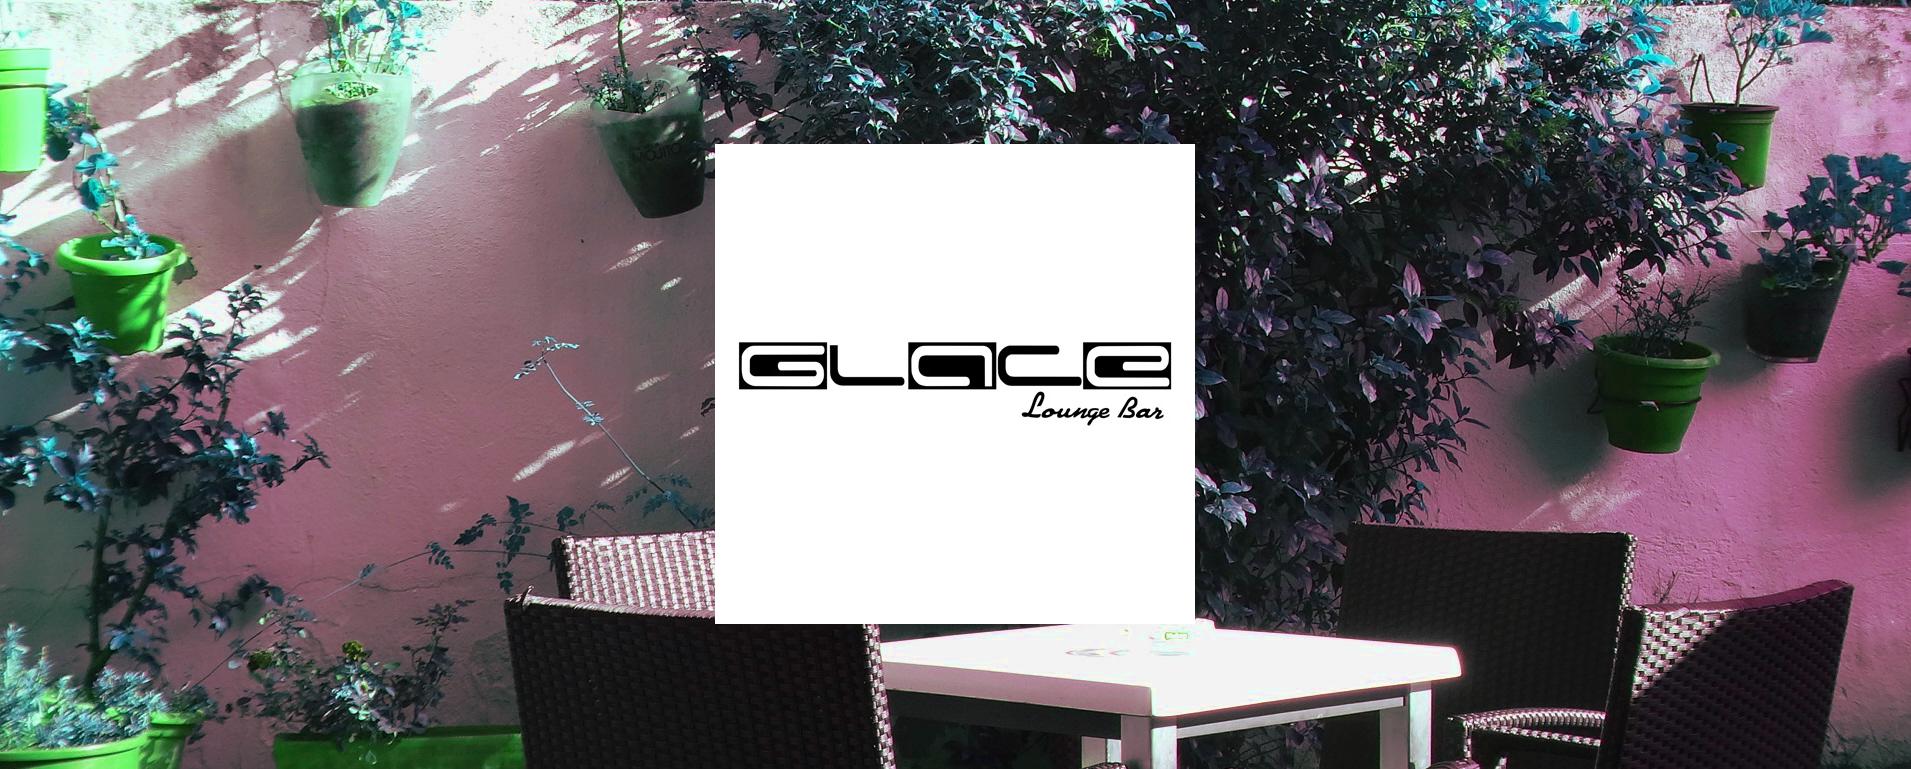 Glace vaporwave